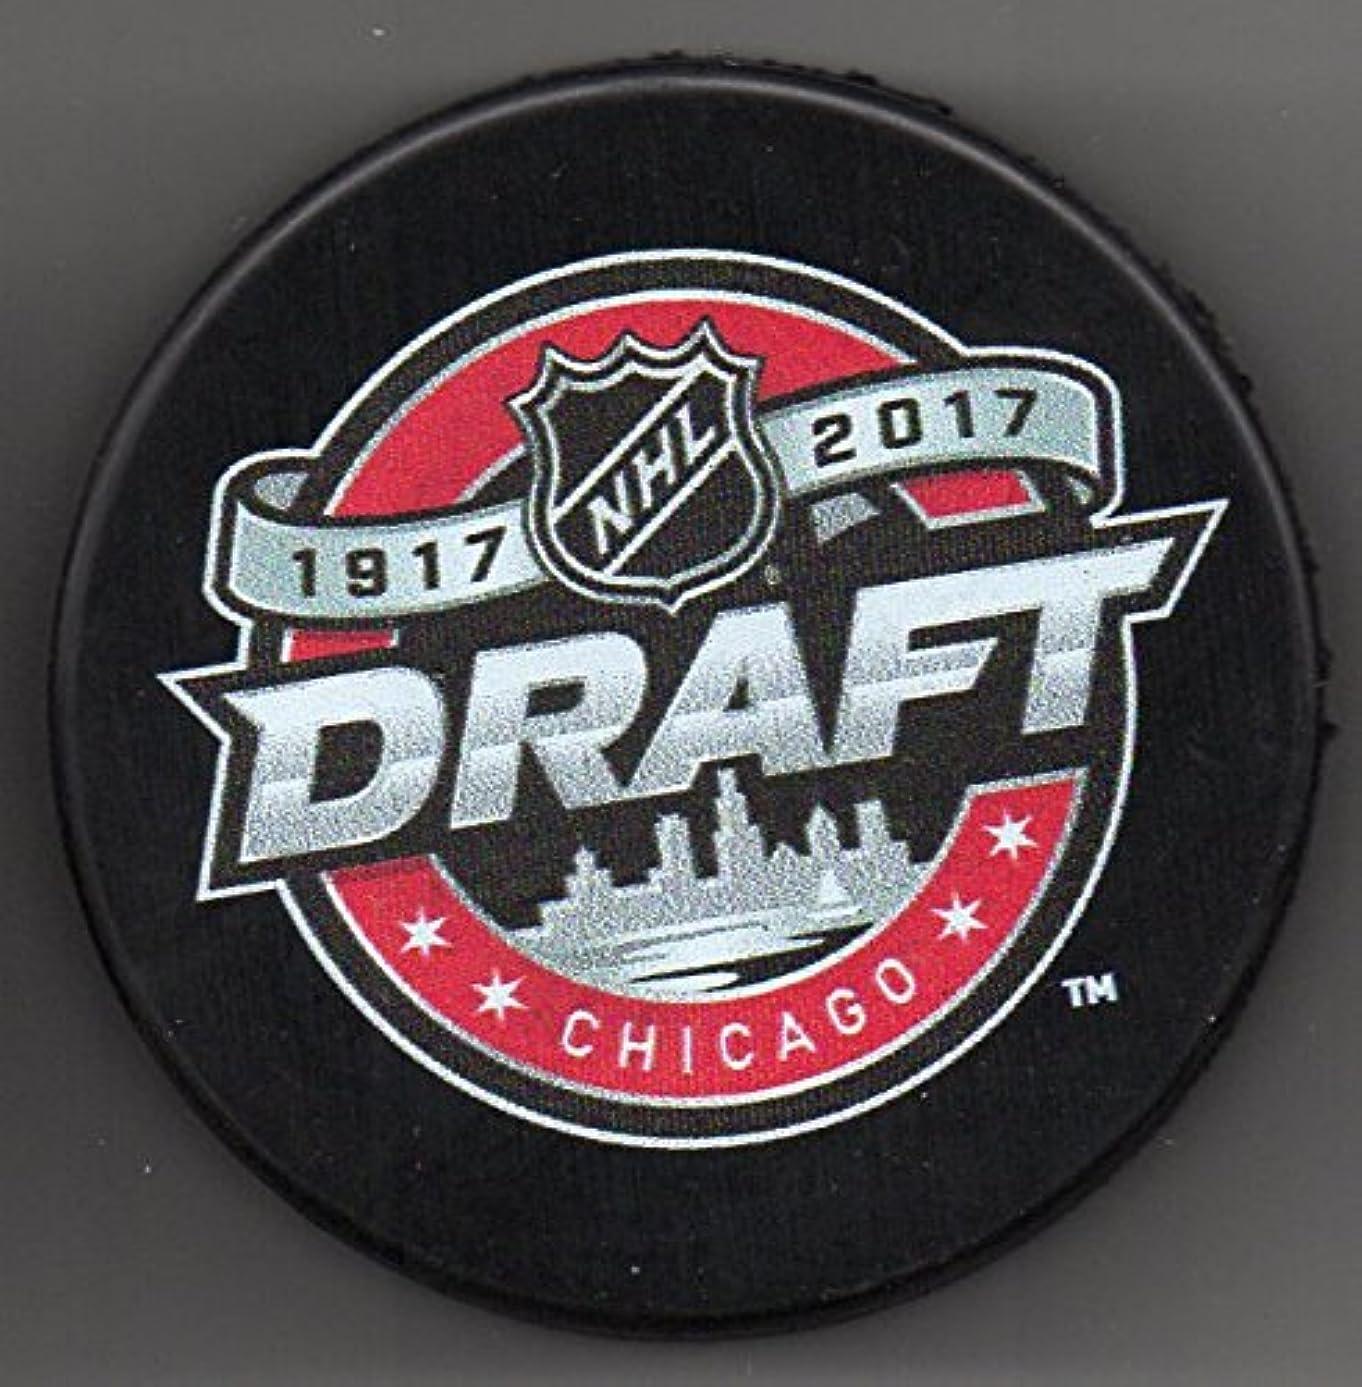 2017 NHL Entry Draft Chicago, IL Blackhawks United Center NHL Hockey Puck + FREE Cube